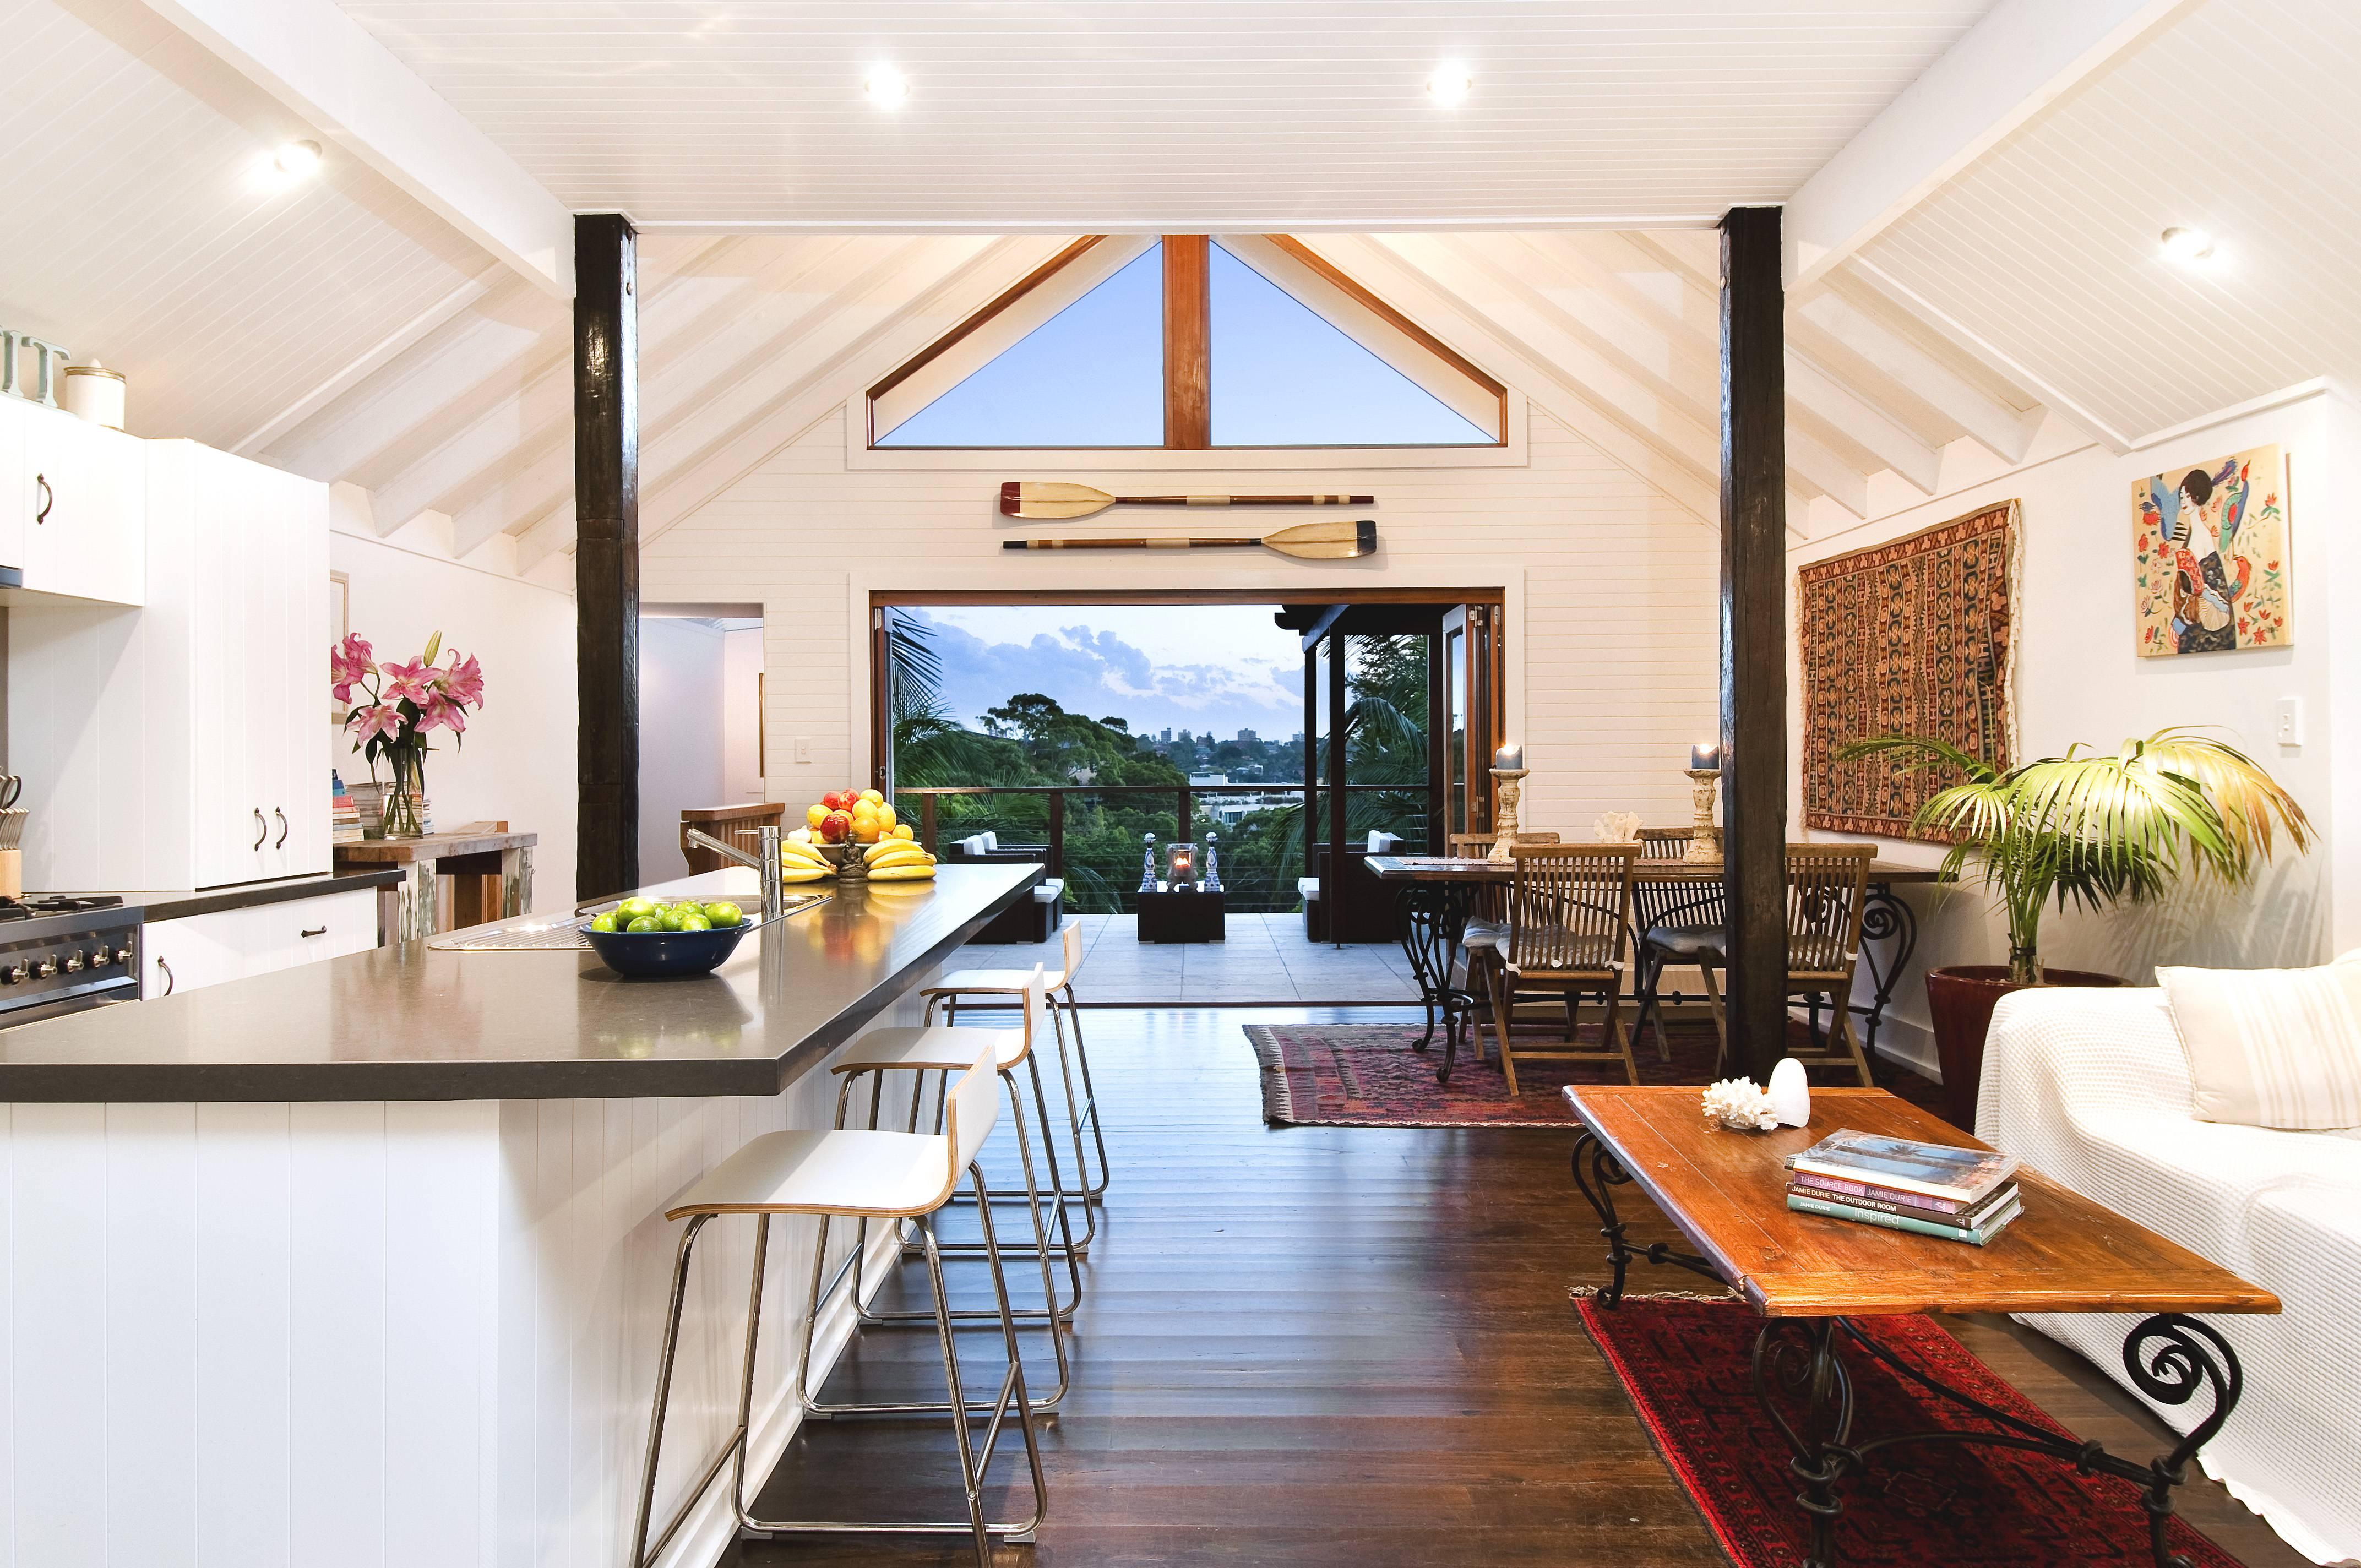 Simple Rustic House Plans Interior Home Design Second Sun ...